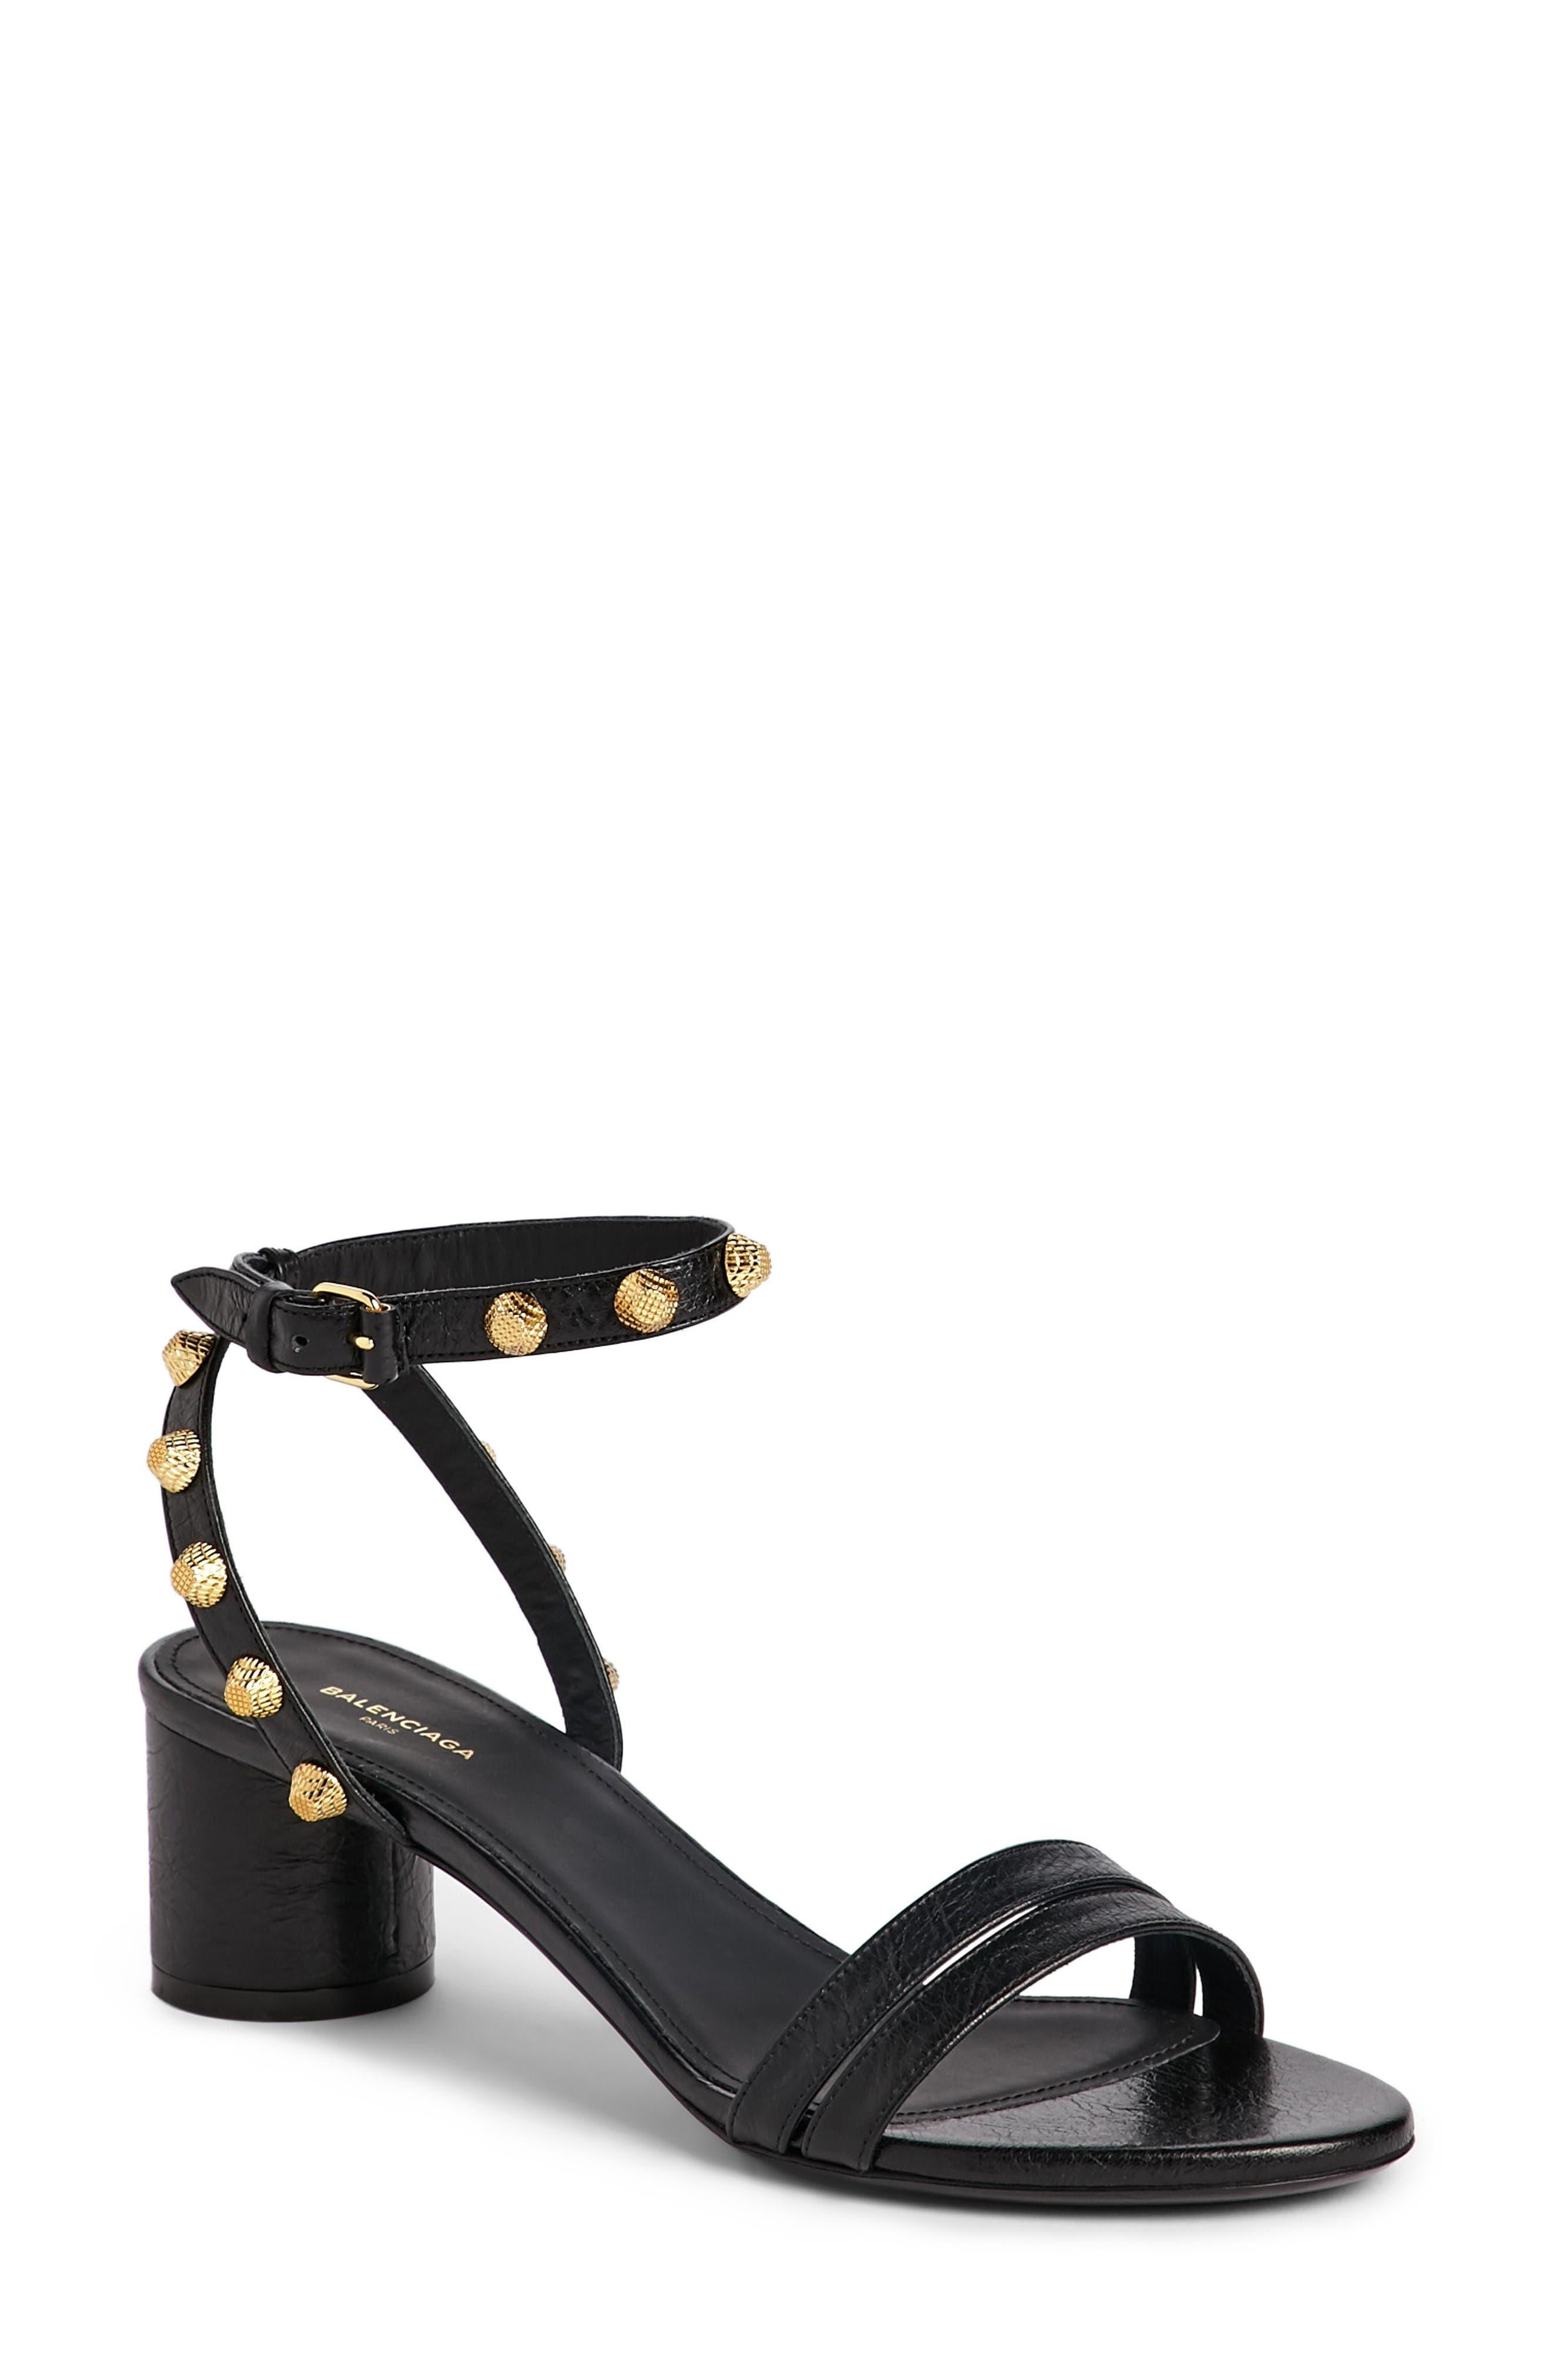 Balenciaga Studded Ankle Strap Sandal